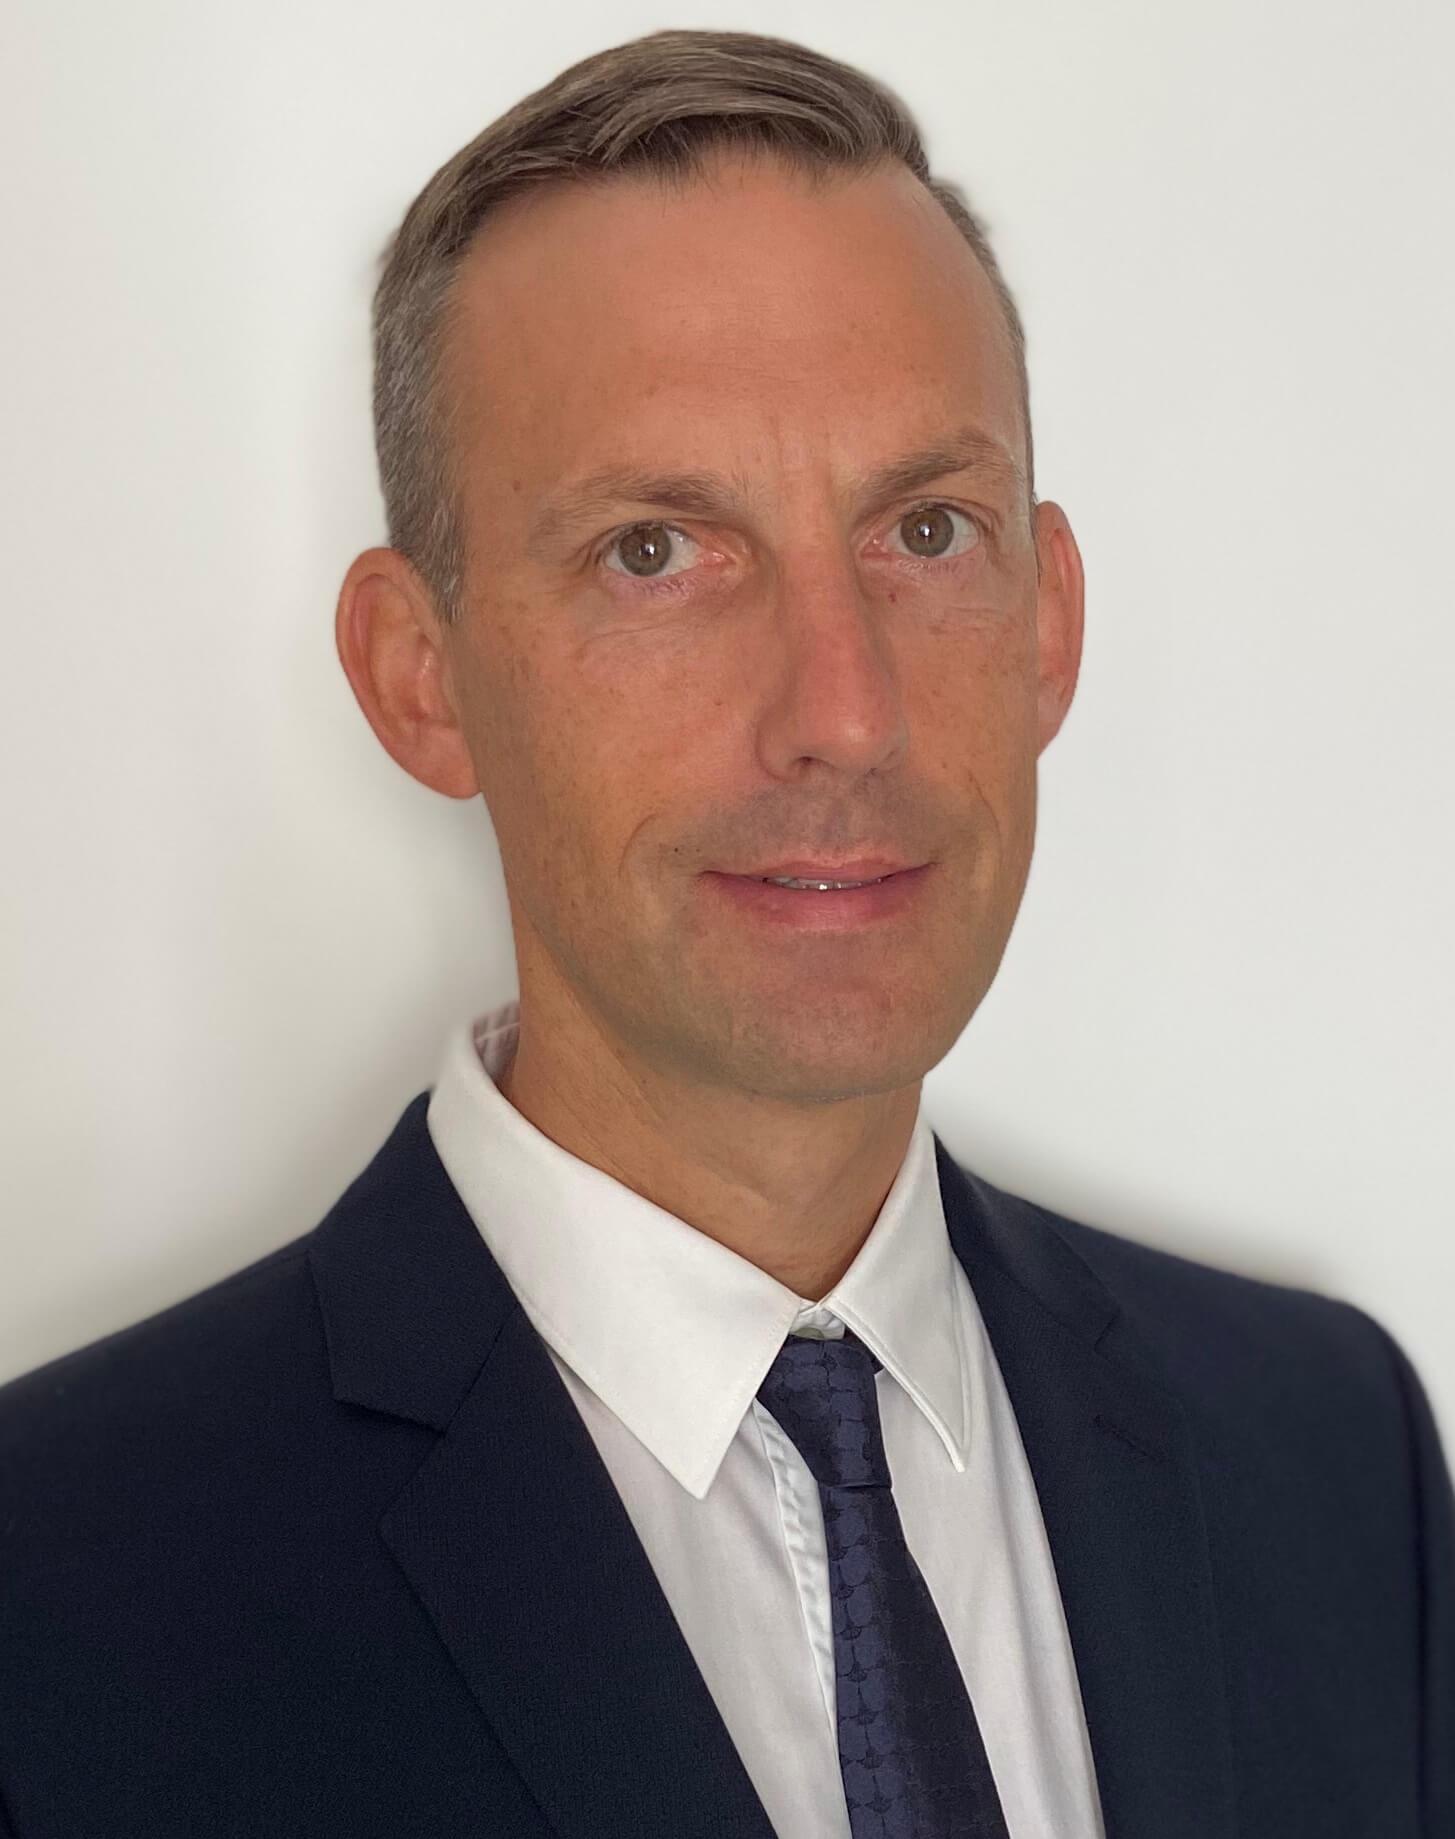 Michael Arzdorf